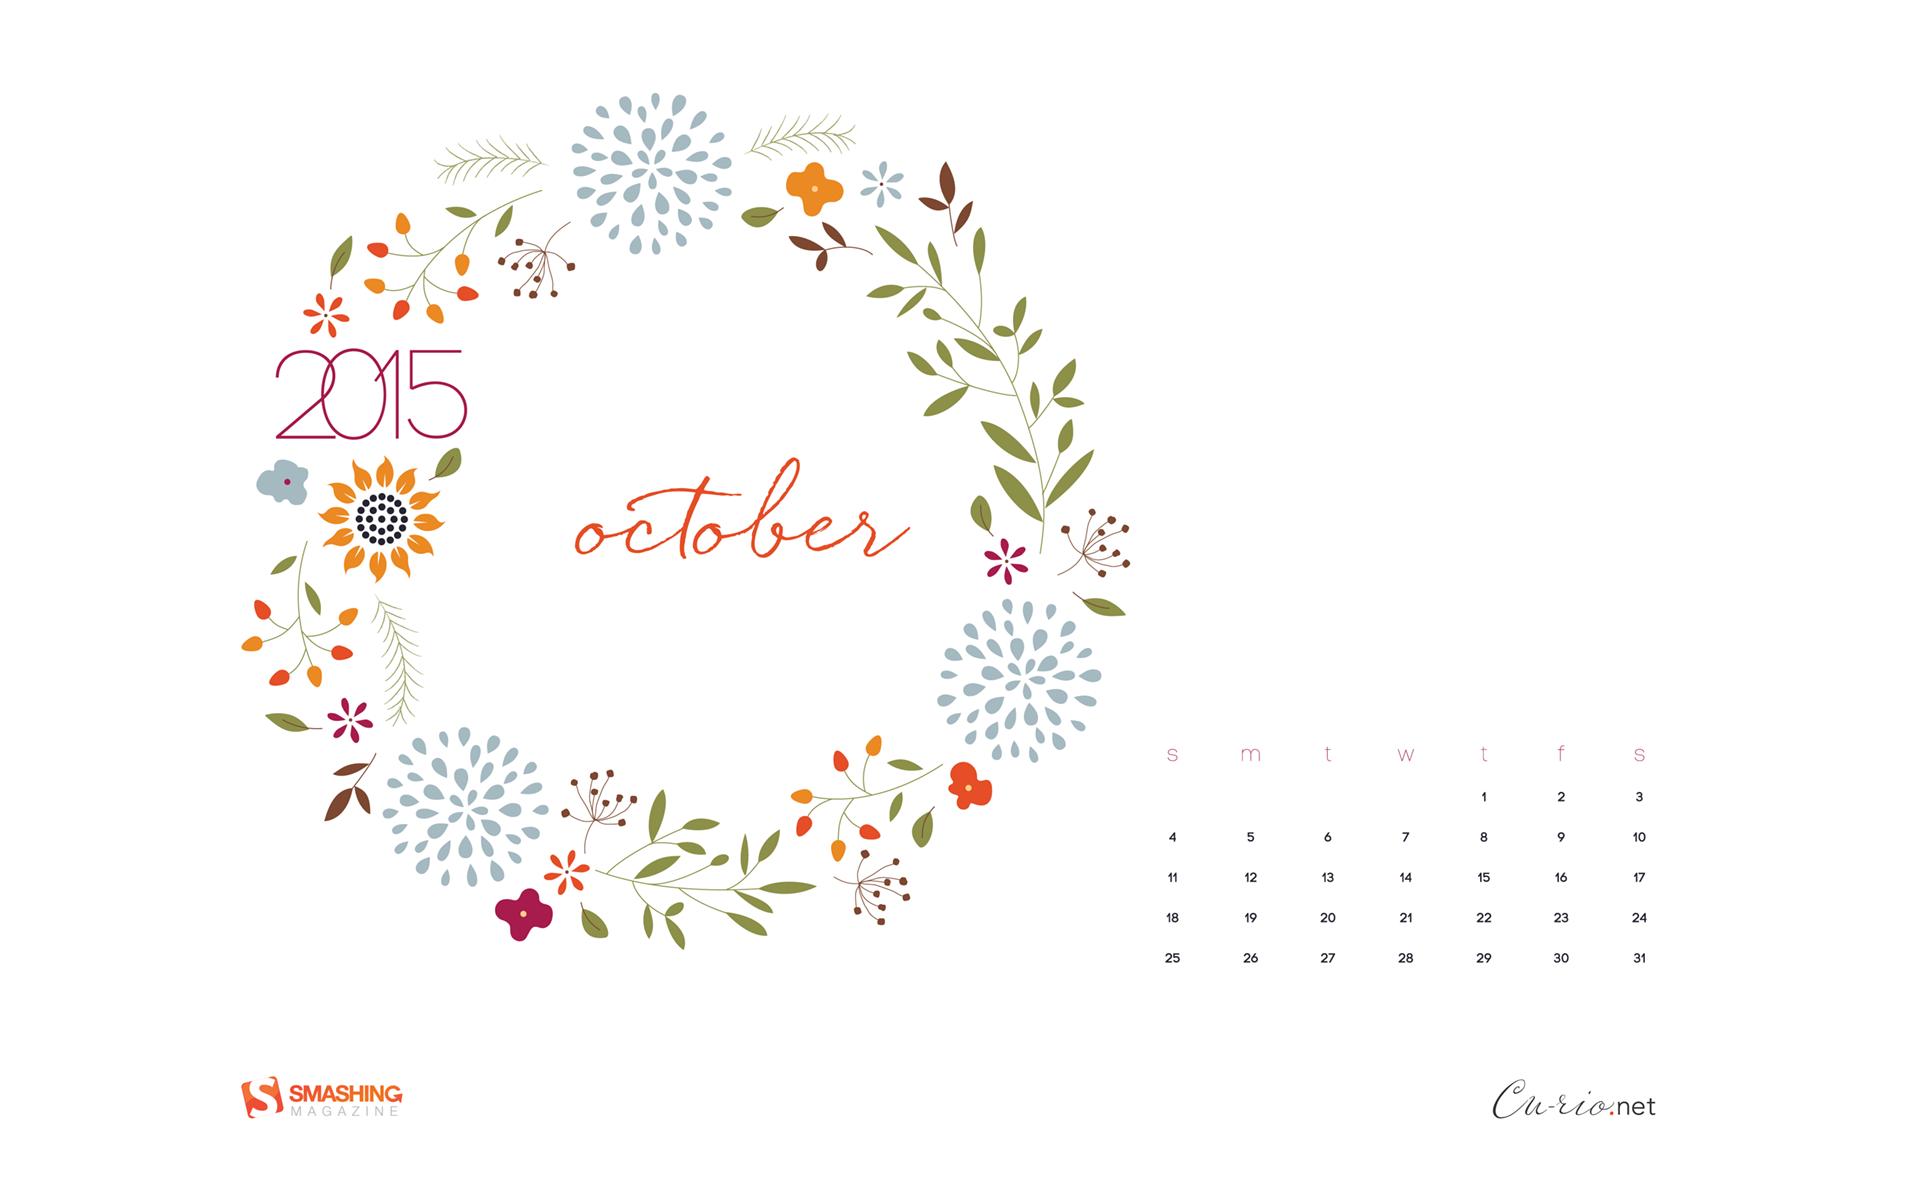 Desktop Calendars Wallpapers October 2015 Fall Floral 1920x1200 1920x1200